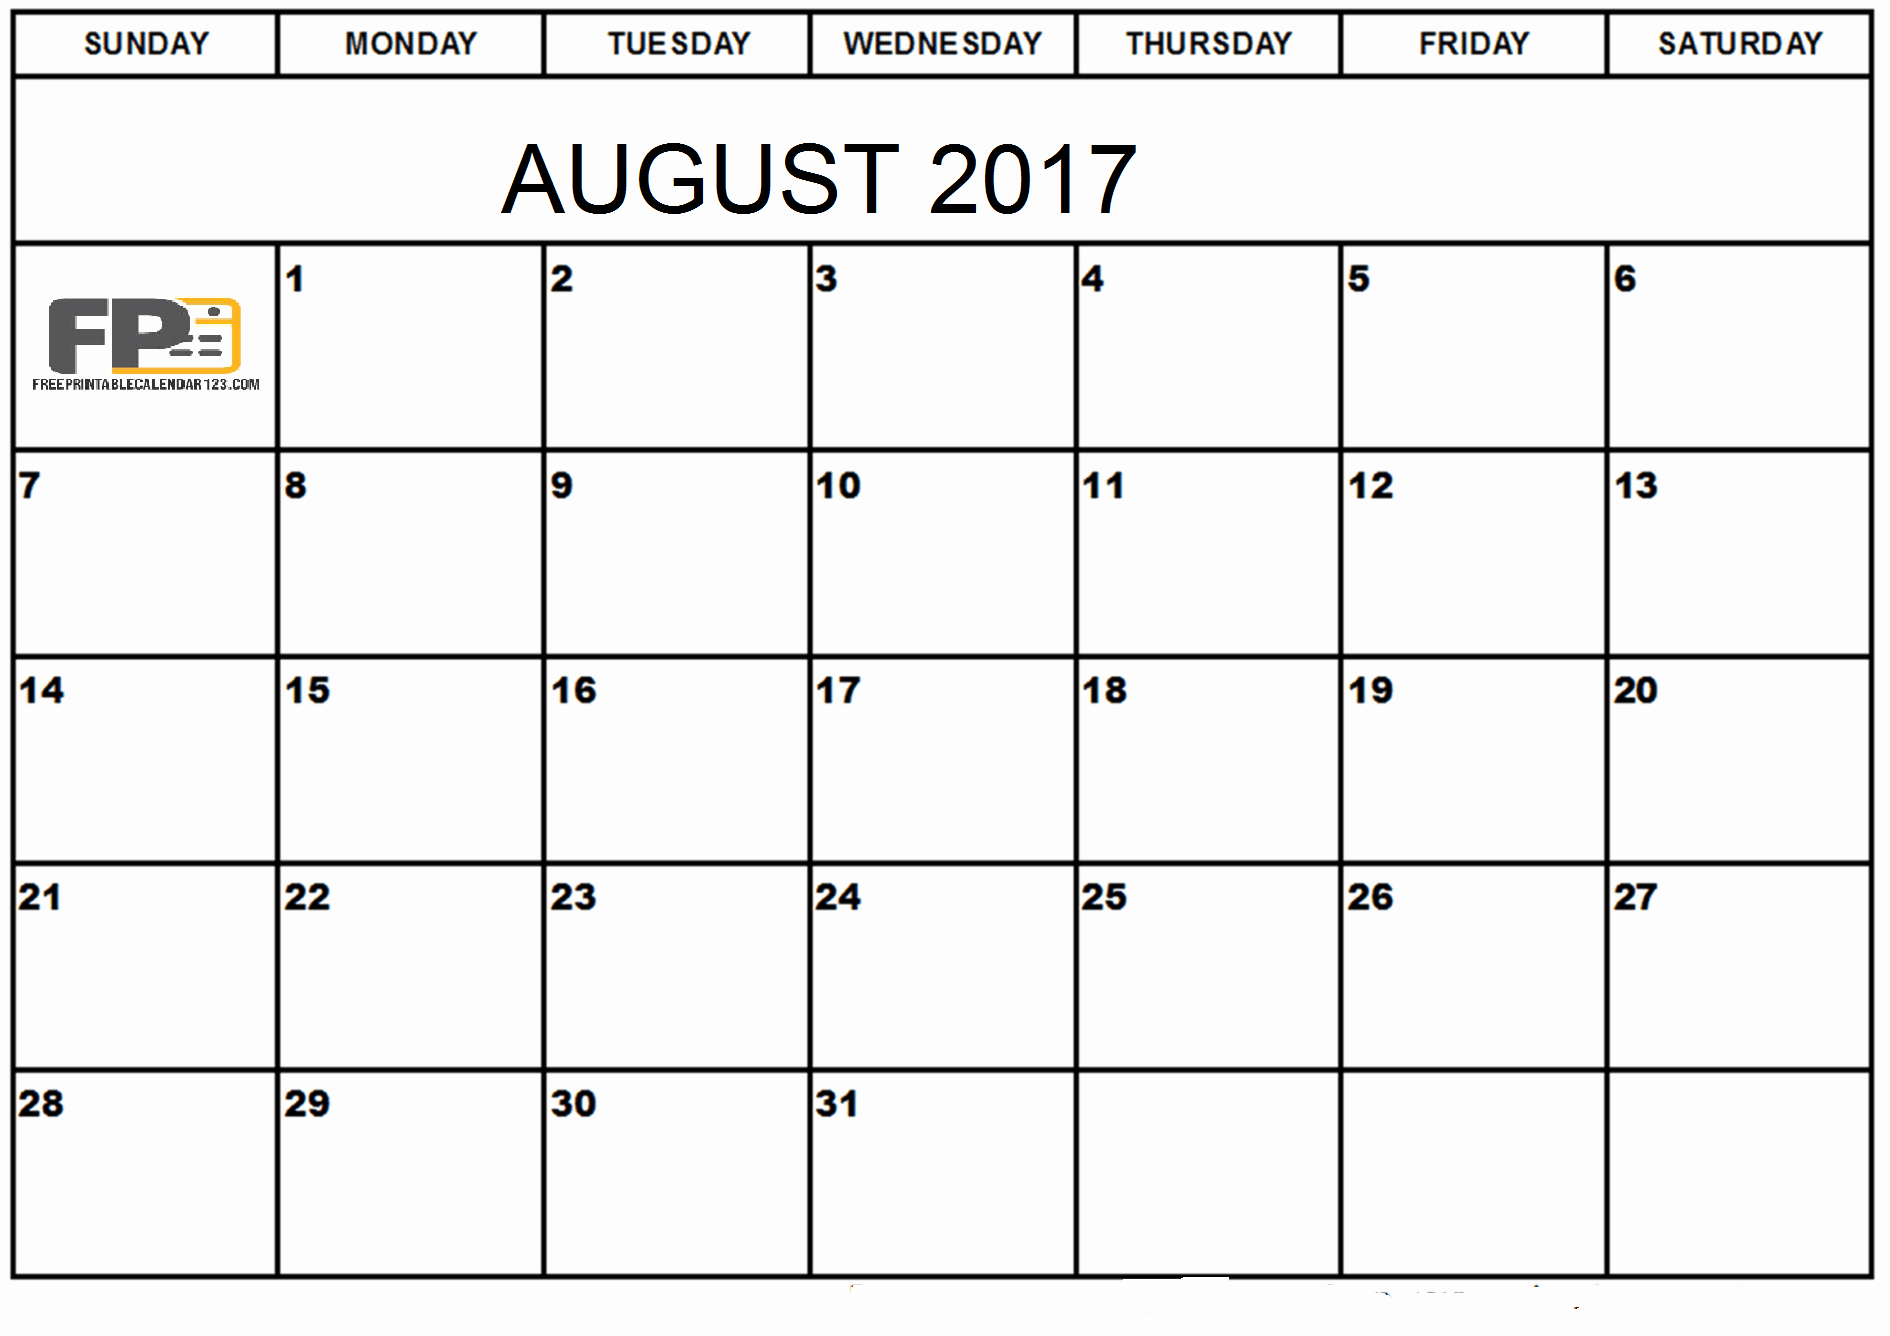 Blank Calendar Template August 2017 Elegant August 2017 Calendar Word